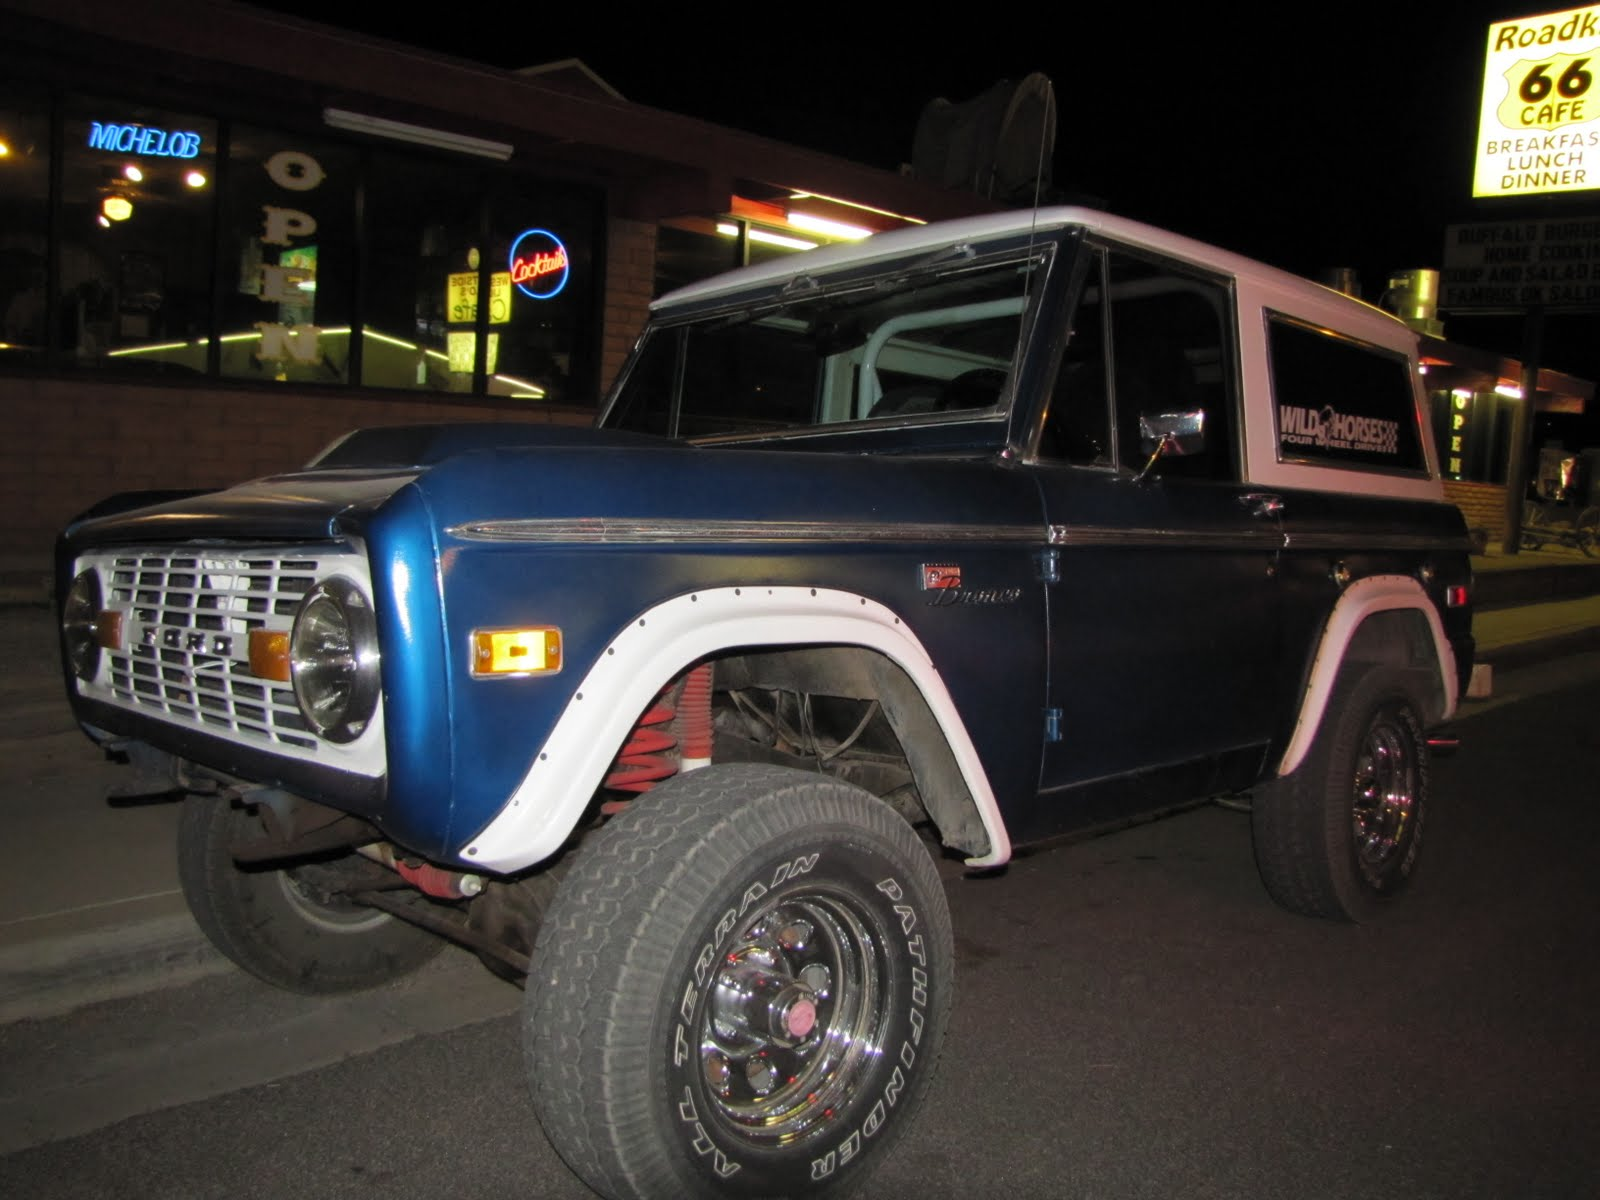 Route 66, Arizona, 1977 Ford Bronco